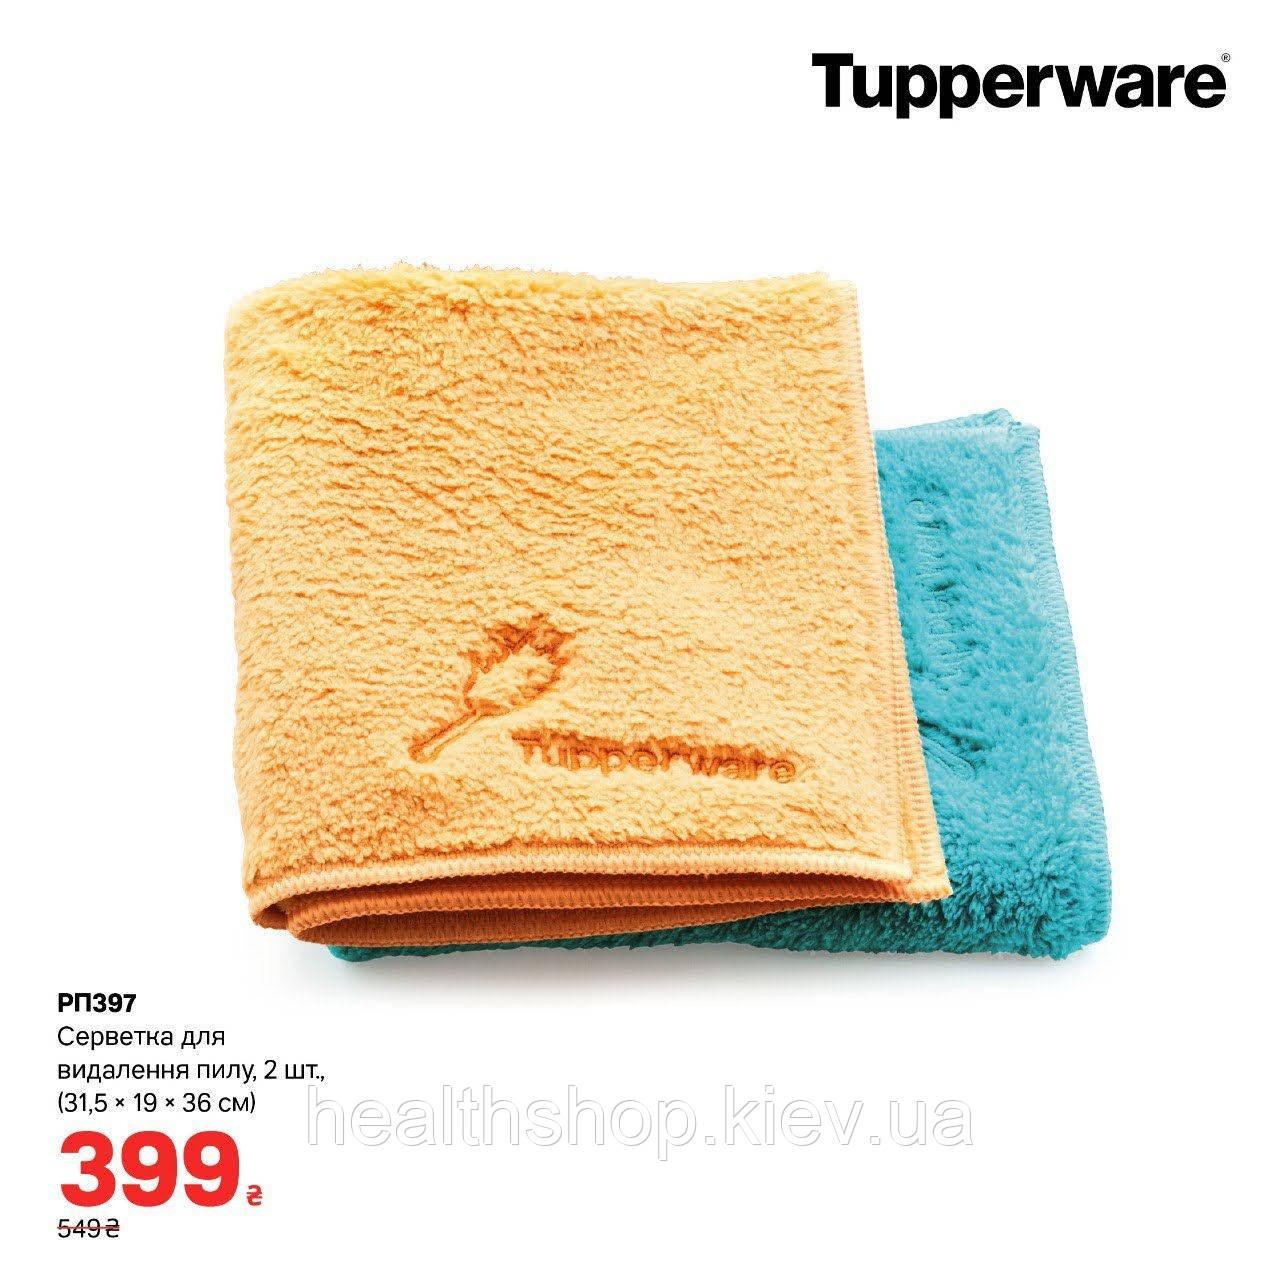 Универсальная салфетка 2 шт. Tupperware (Тапервер)